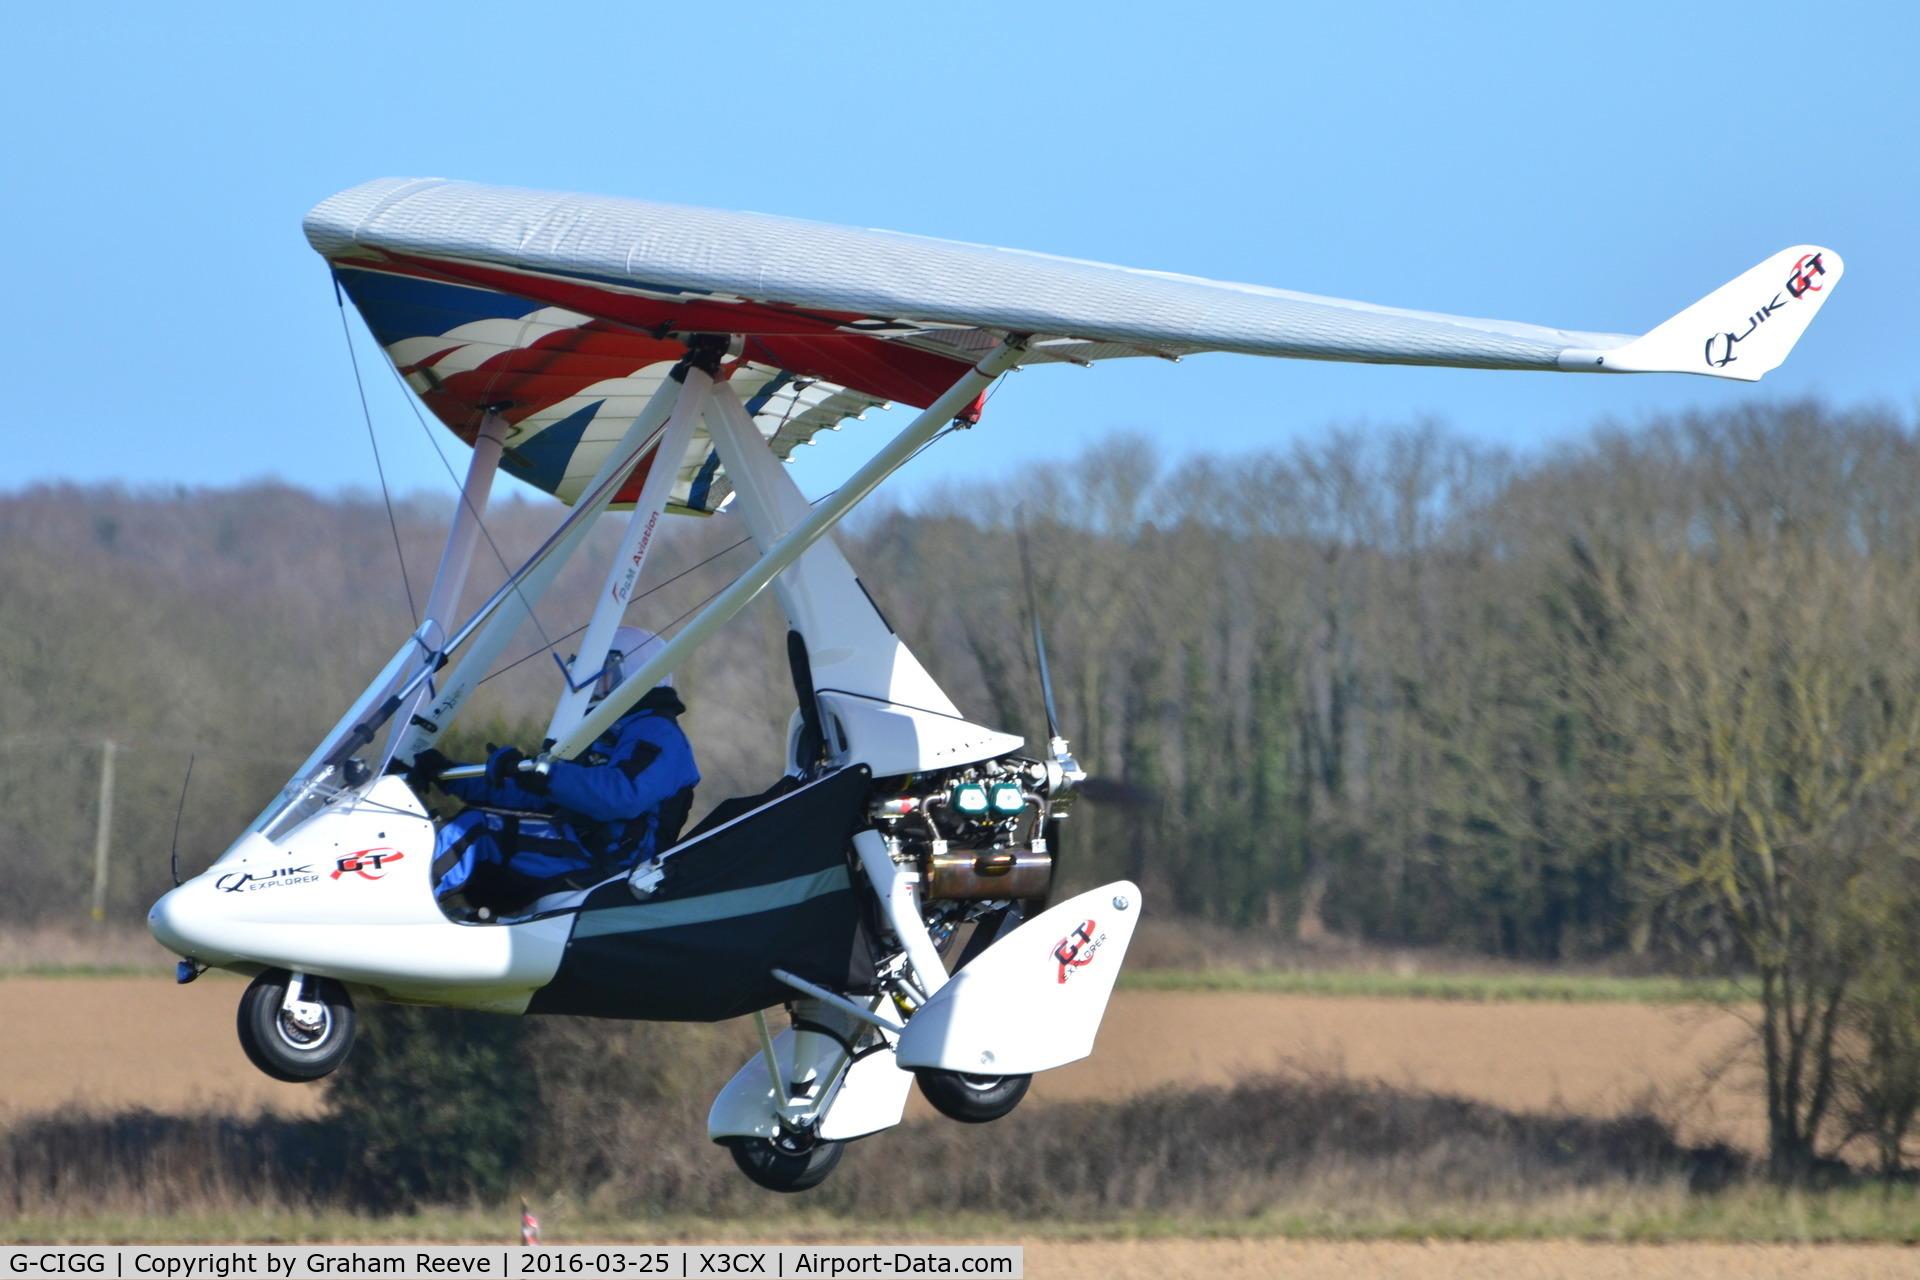 G-CIGG, 2014 P&M Aviation Quik GTR C/N 8690, Departing from Northrepps.